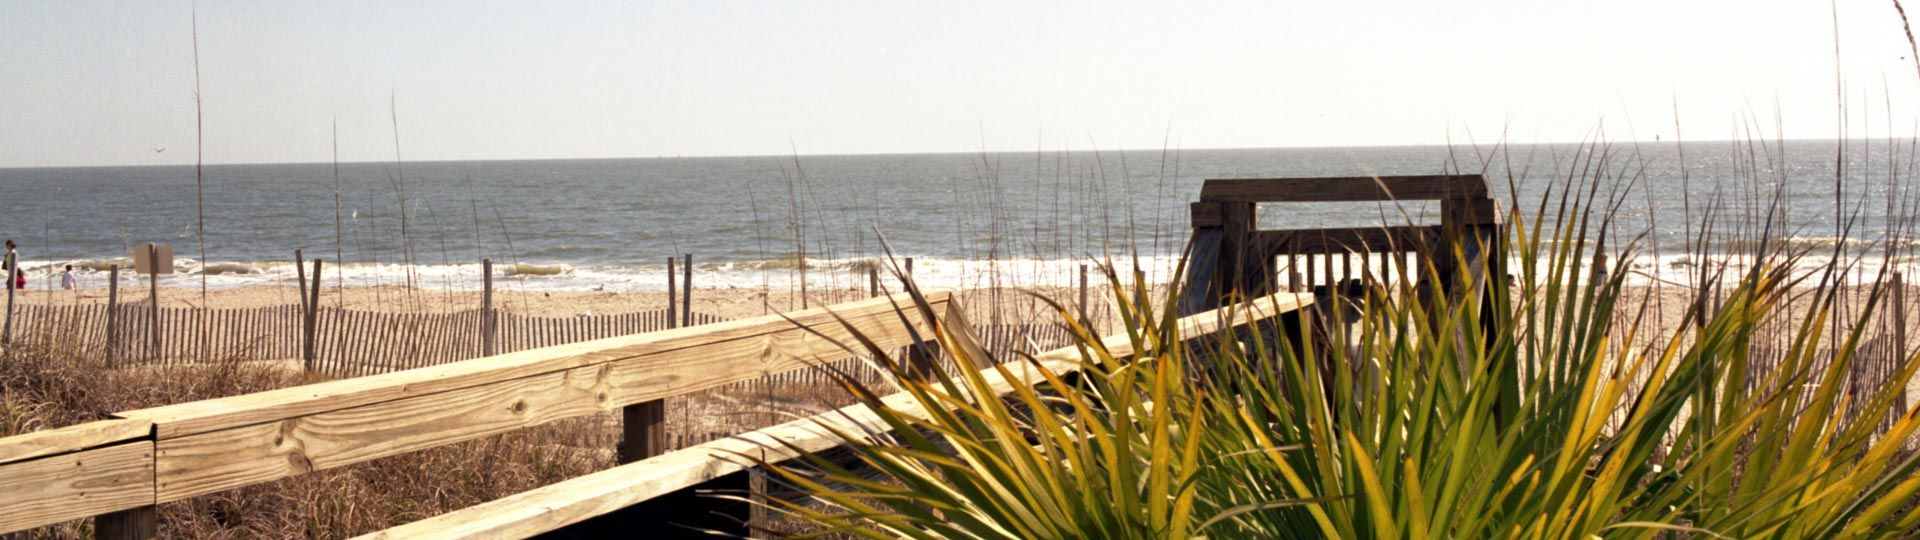 Tybee Island Beach Weather